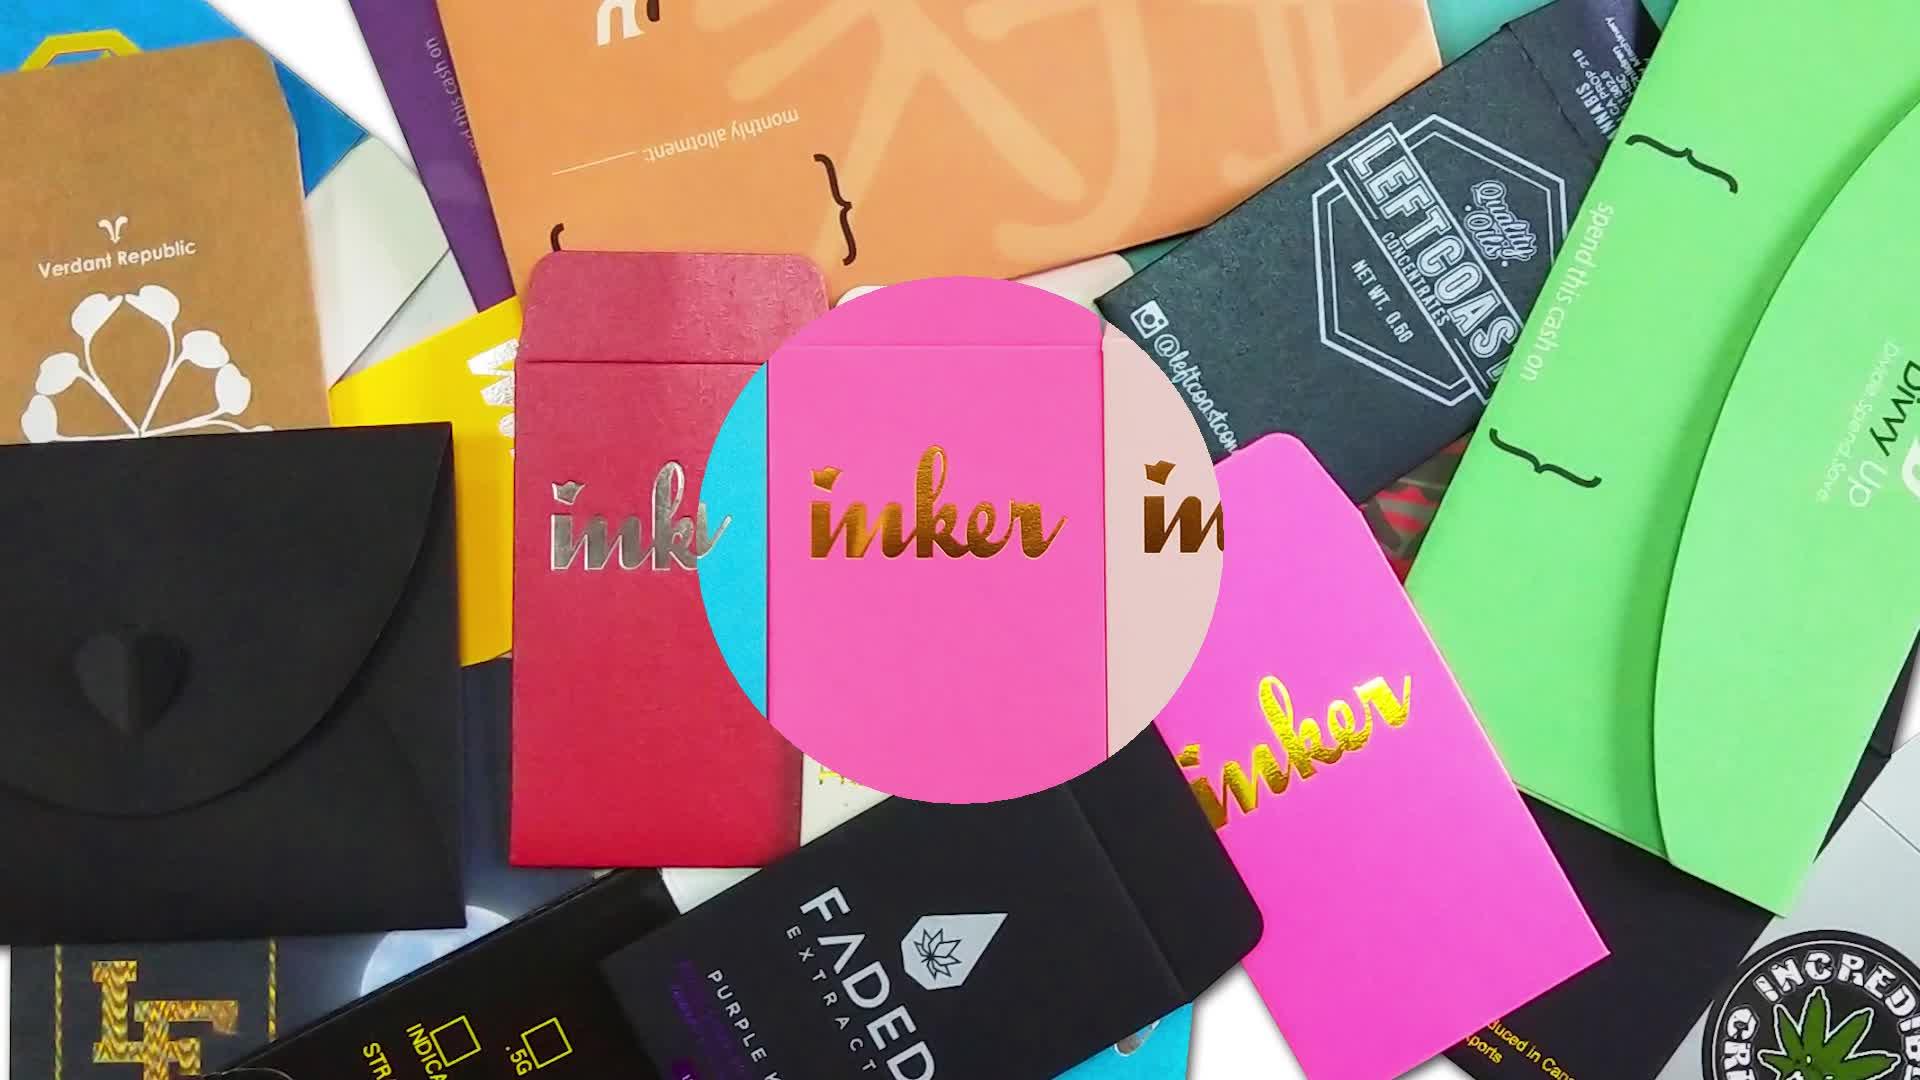 Kualitas Tinggi Warna-warni Kustom Pecah Envelopes CMYK Trendi Ketegangan Label Konsentrat Kemasan Ekstrak Amplop Kemasan